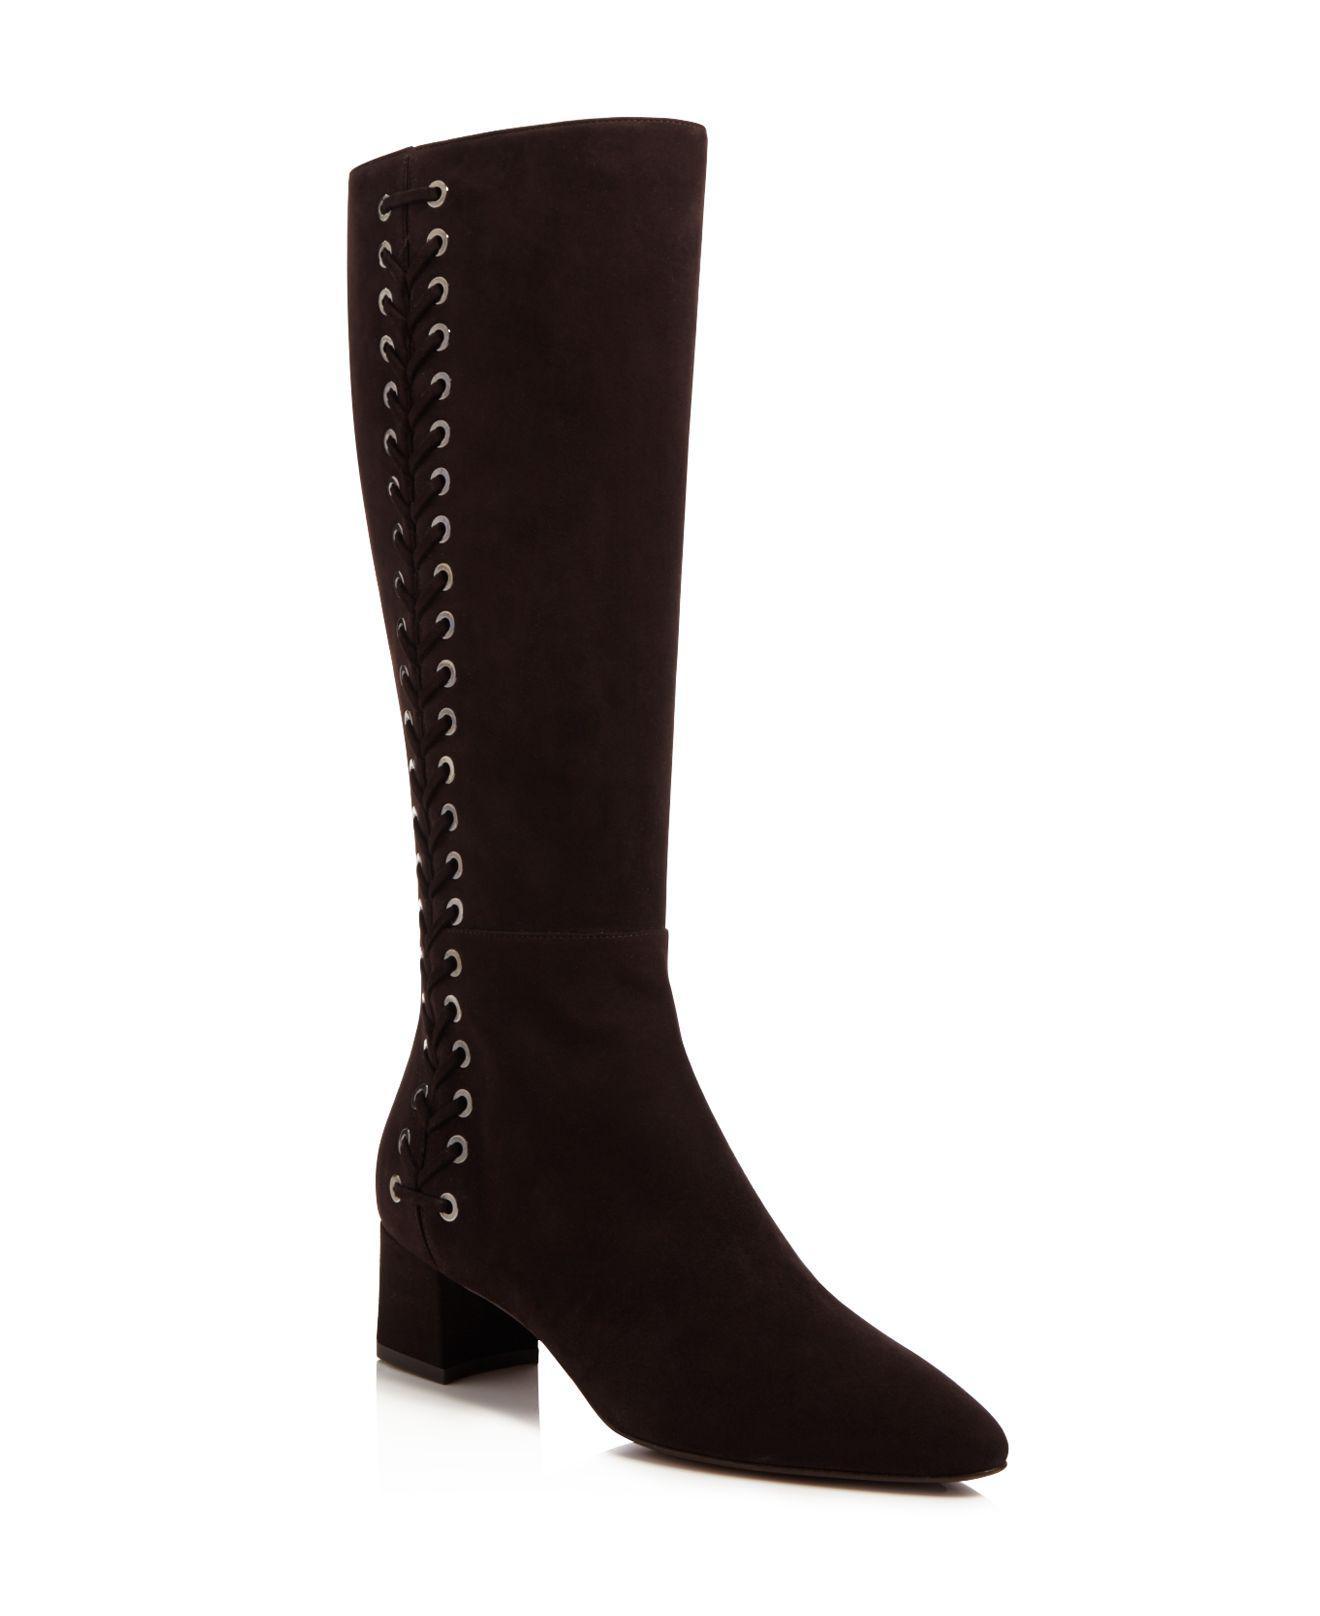 Aquatalia Womens Black Perri Weatherproof Laced Tall Boots